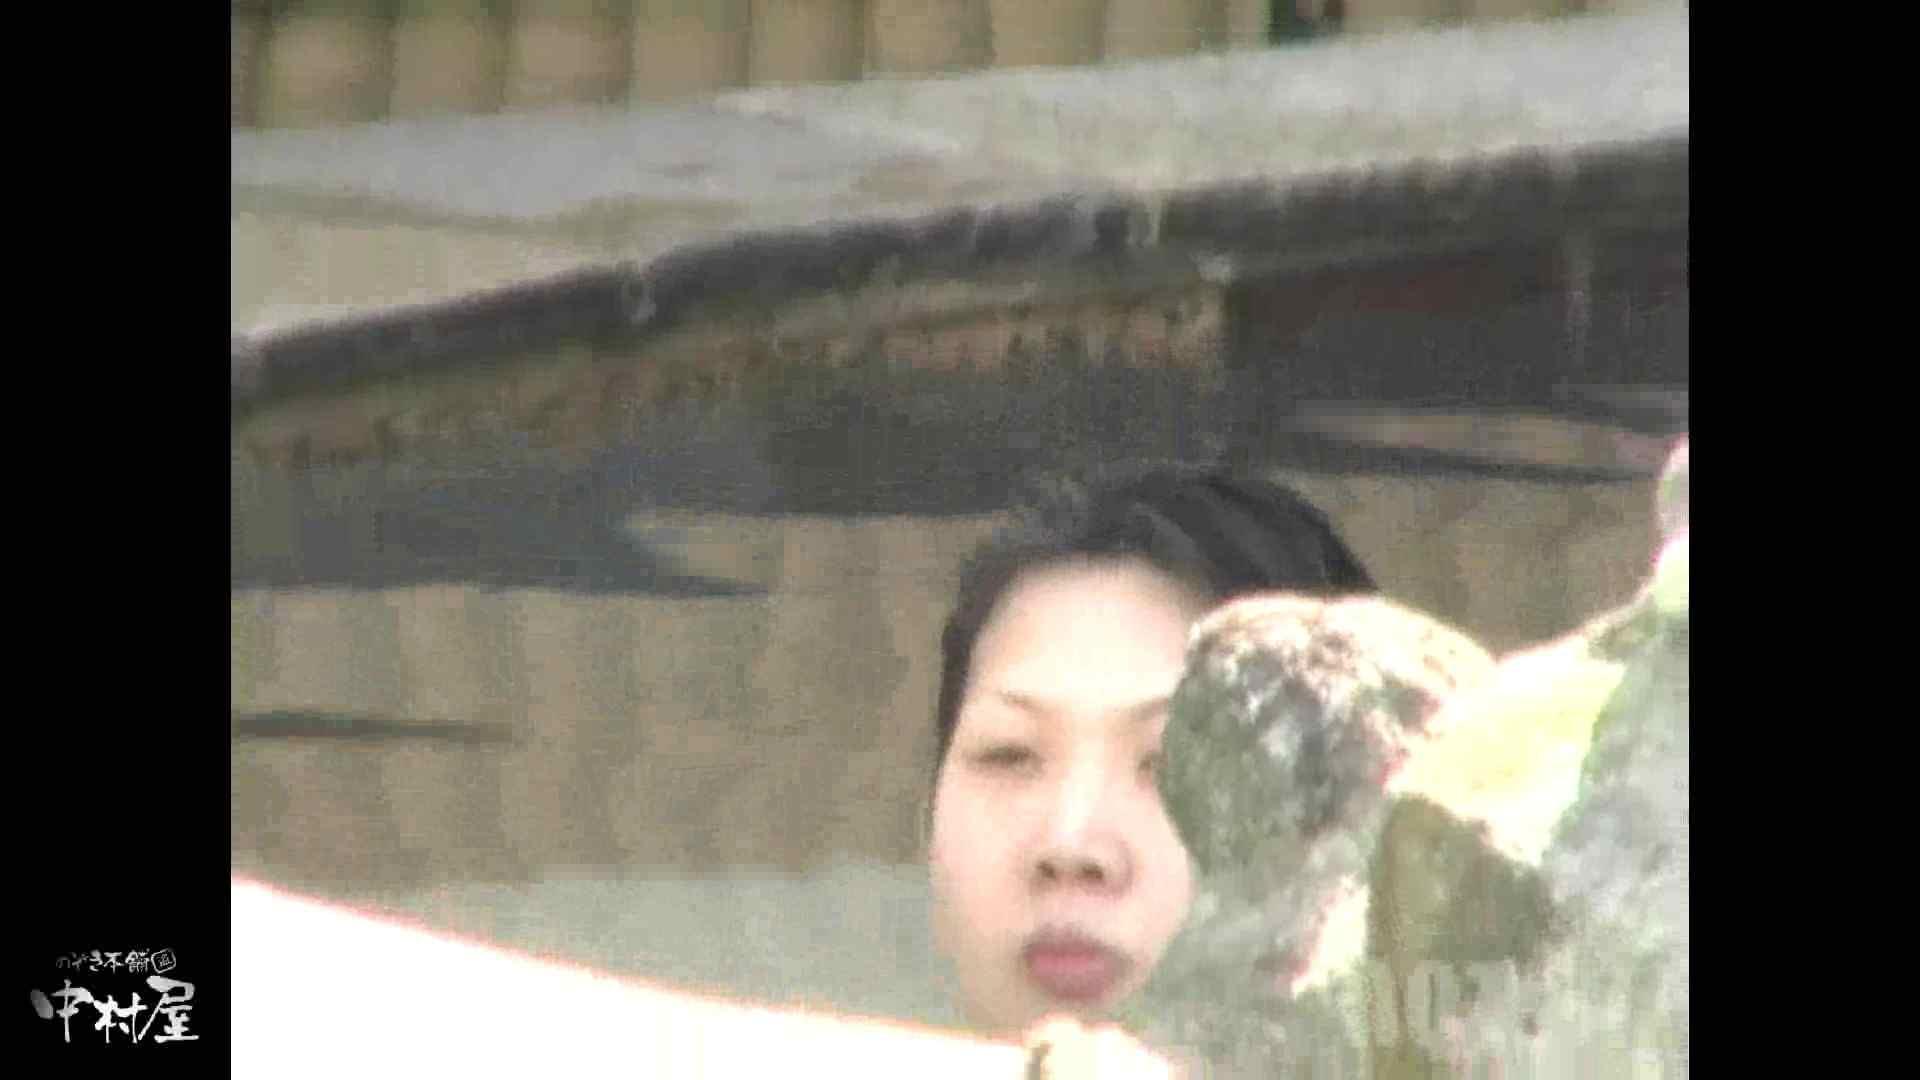 Aquaな露天風呂Vol.881潜入盗撮露天風呂十七判湯 其の三 盗撮 AV動画キャプチャ 72画像 26